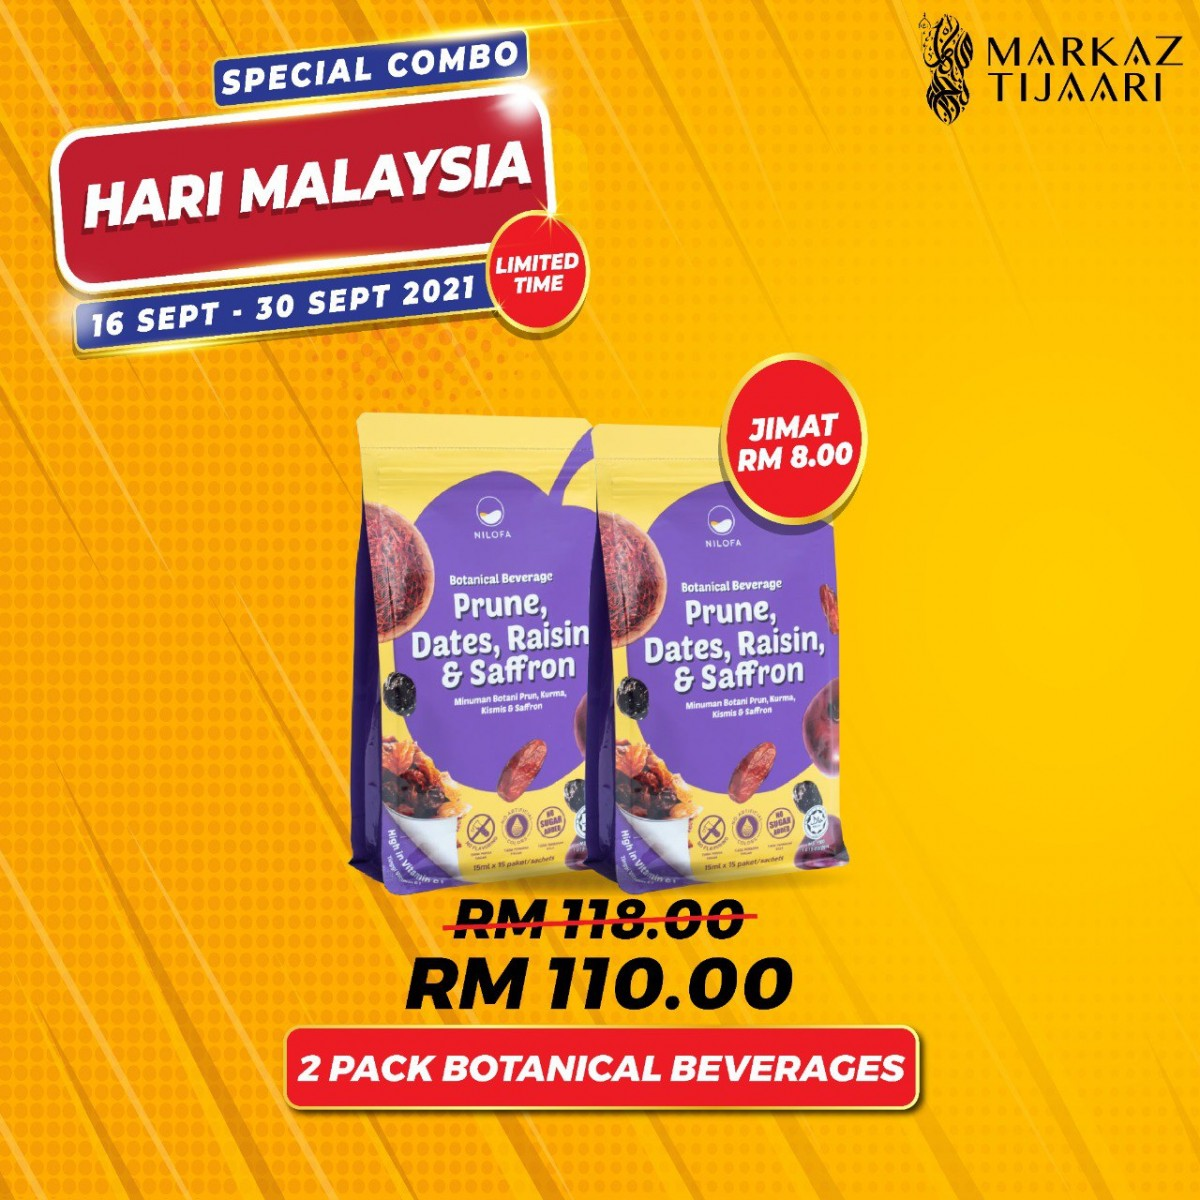 Malaysia Day Deals 2 Pack Botanical Beverage - MARKAZ TIJAARI